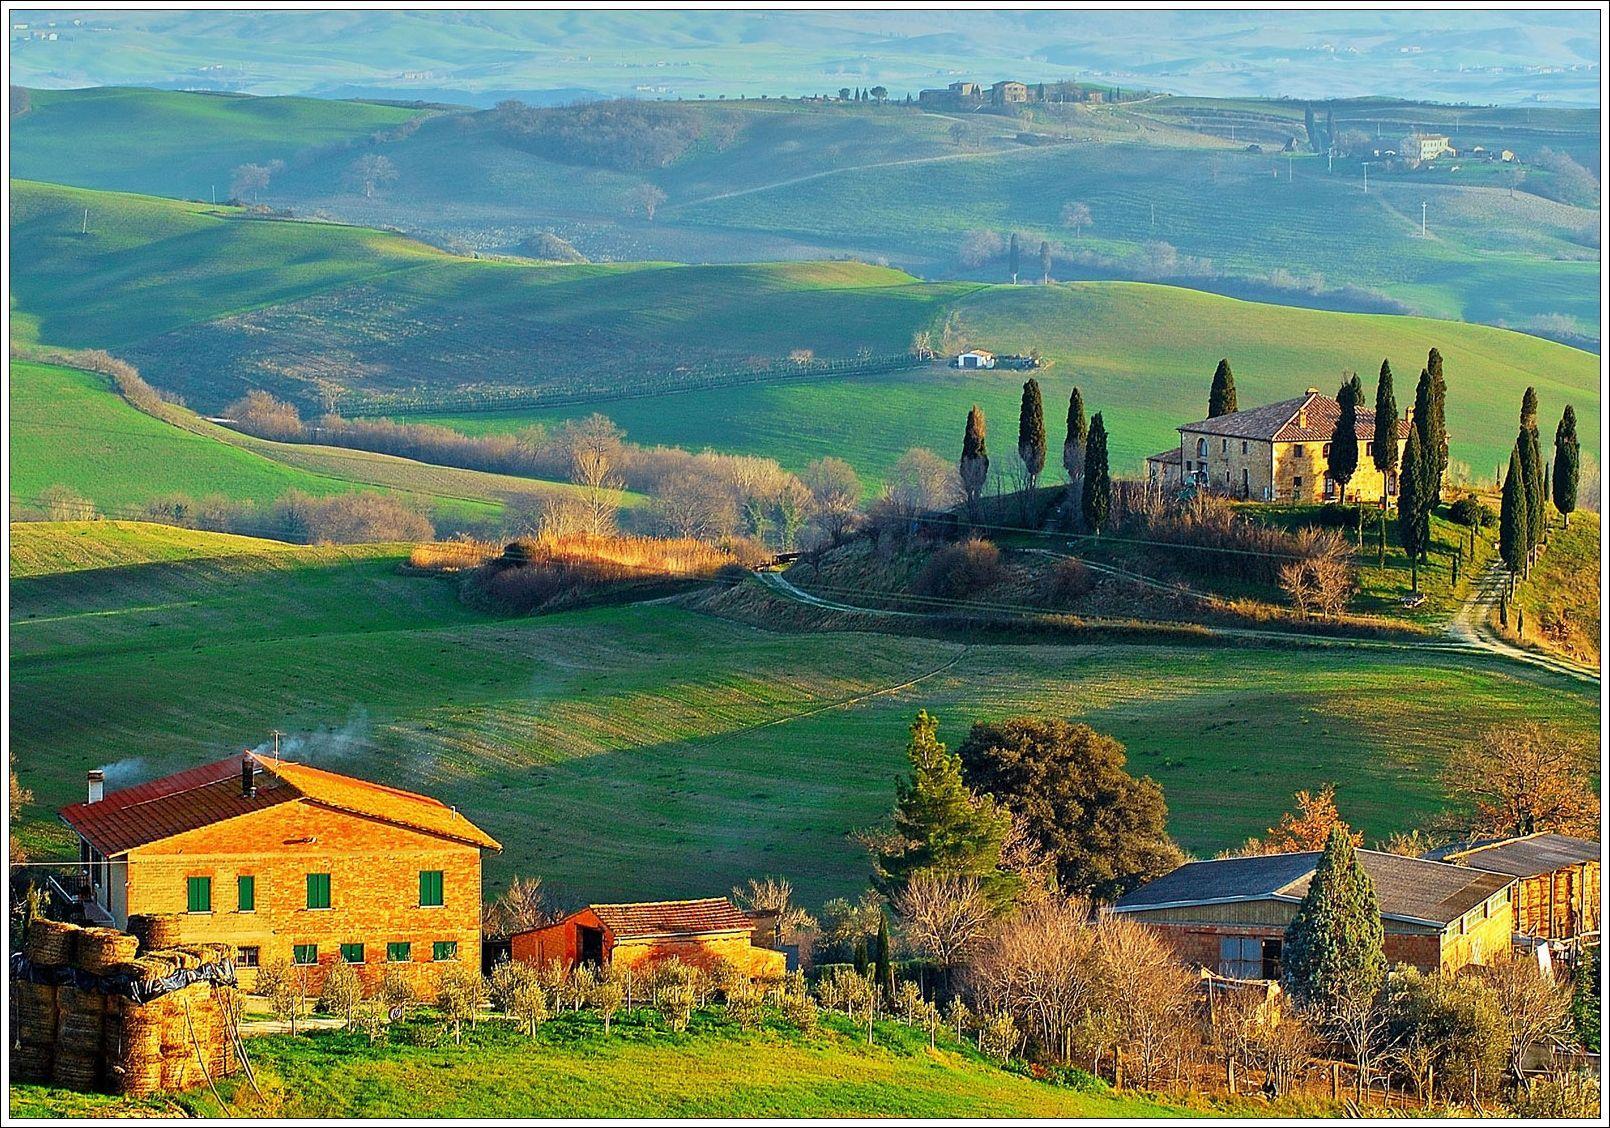 Tuscany Desktop Wallpapers - Top Free Tuscany Desktop ...